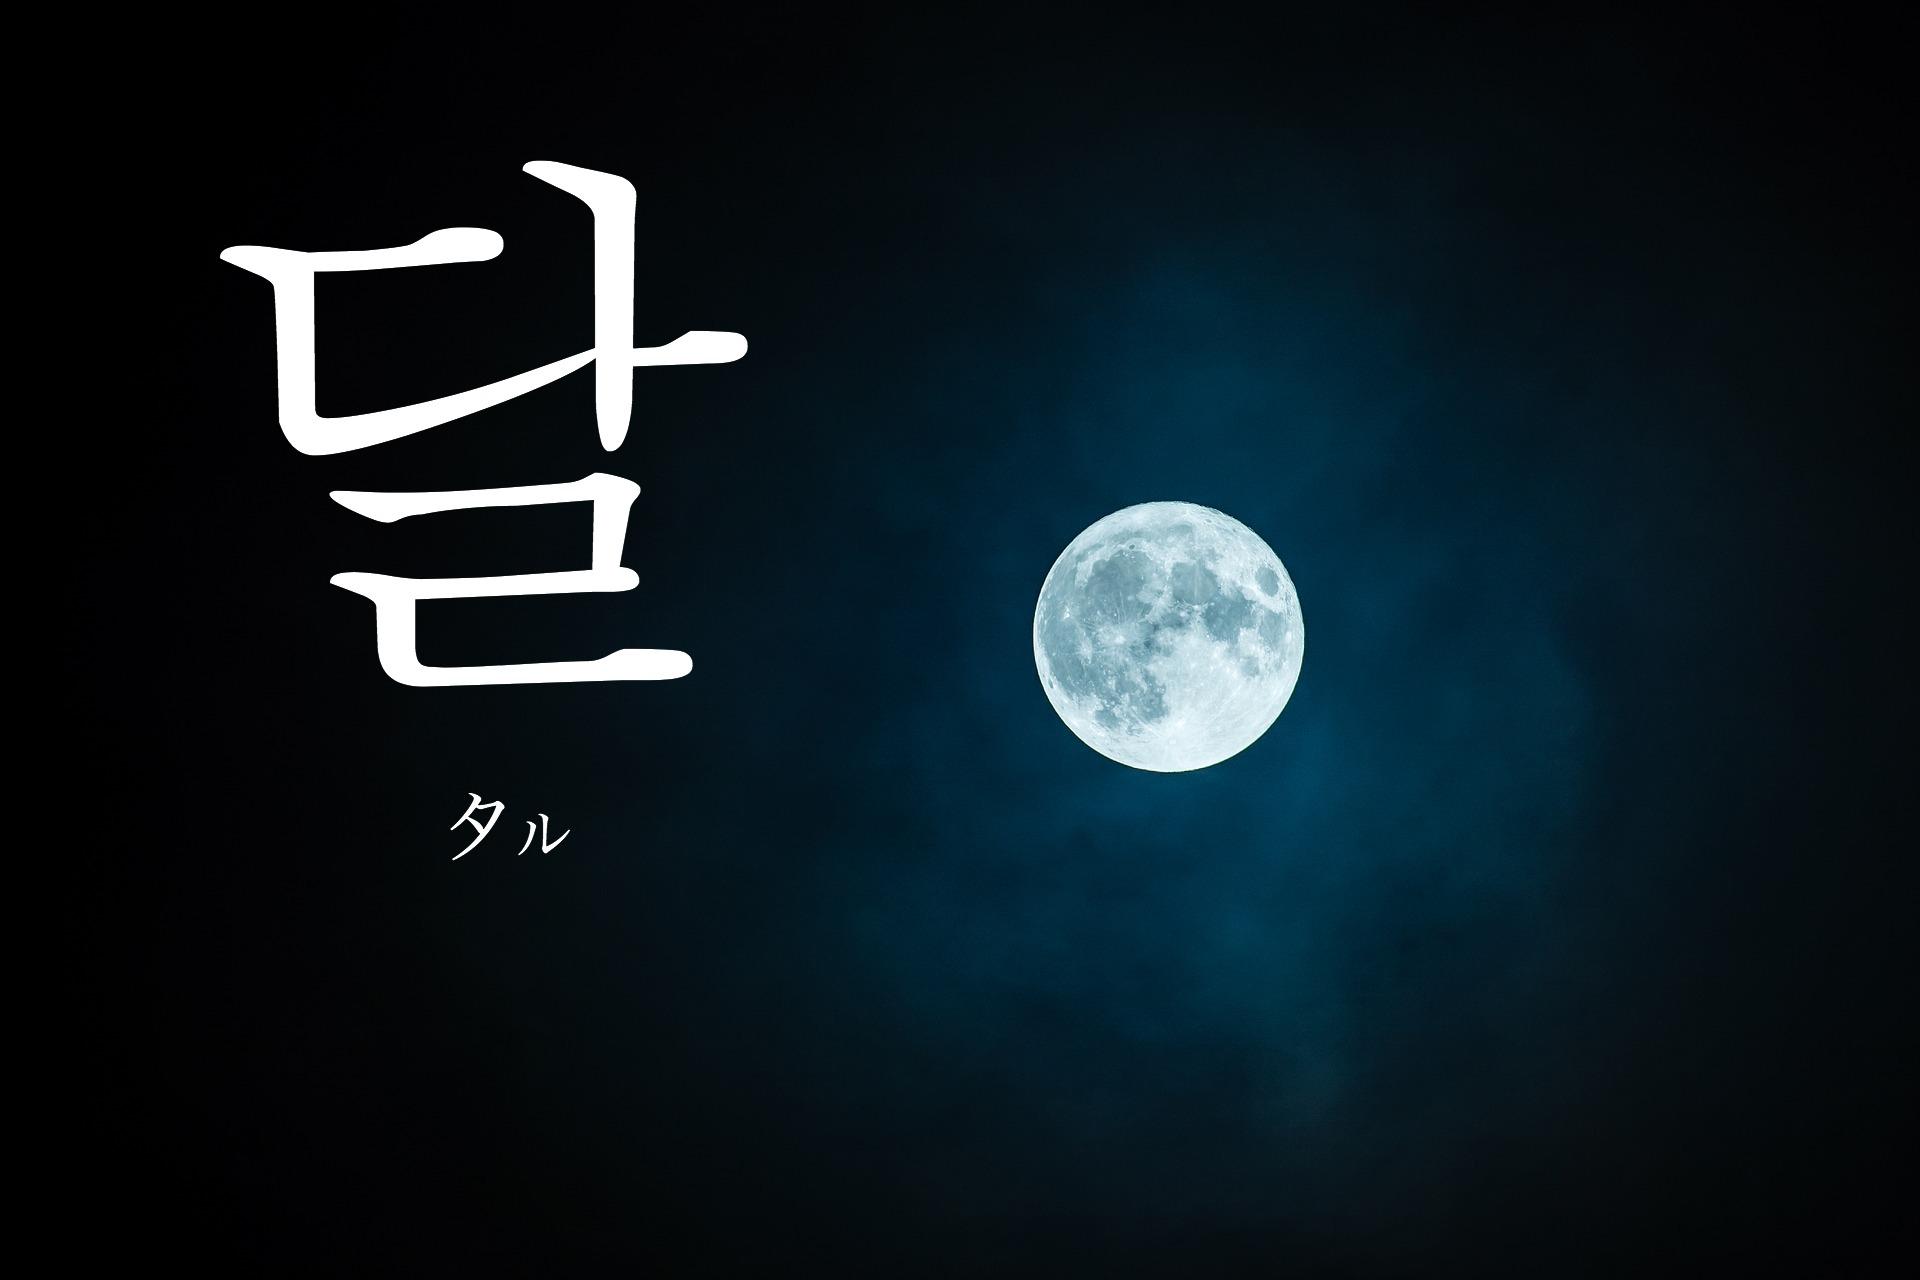 koreanword-moon